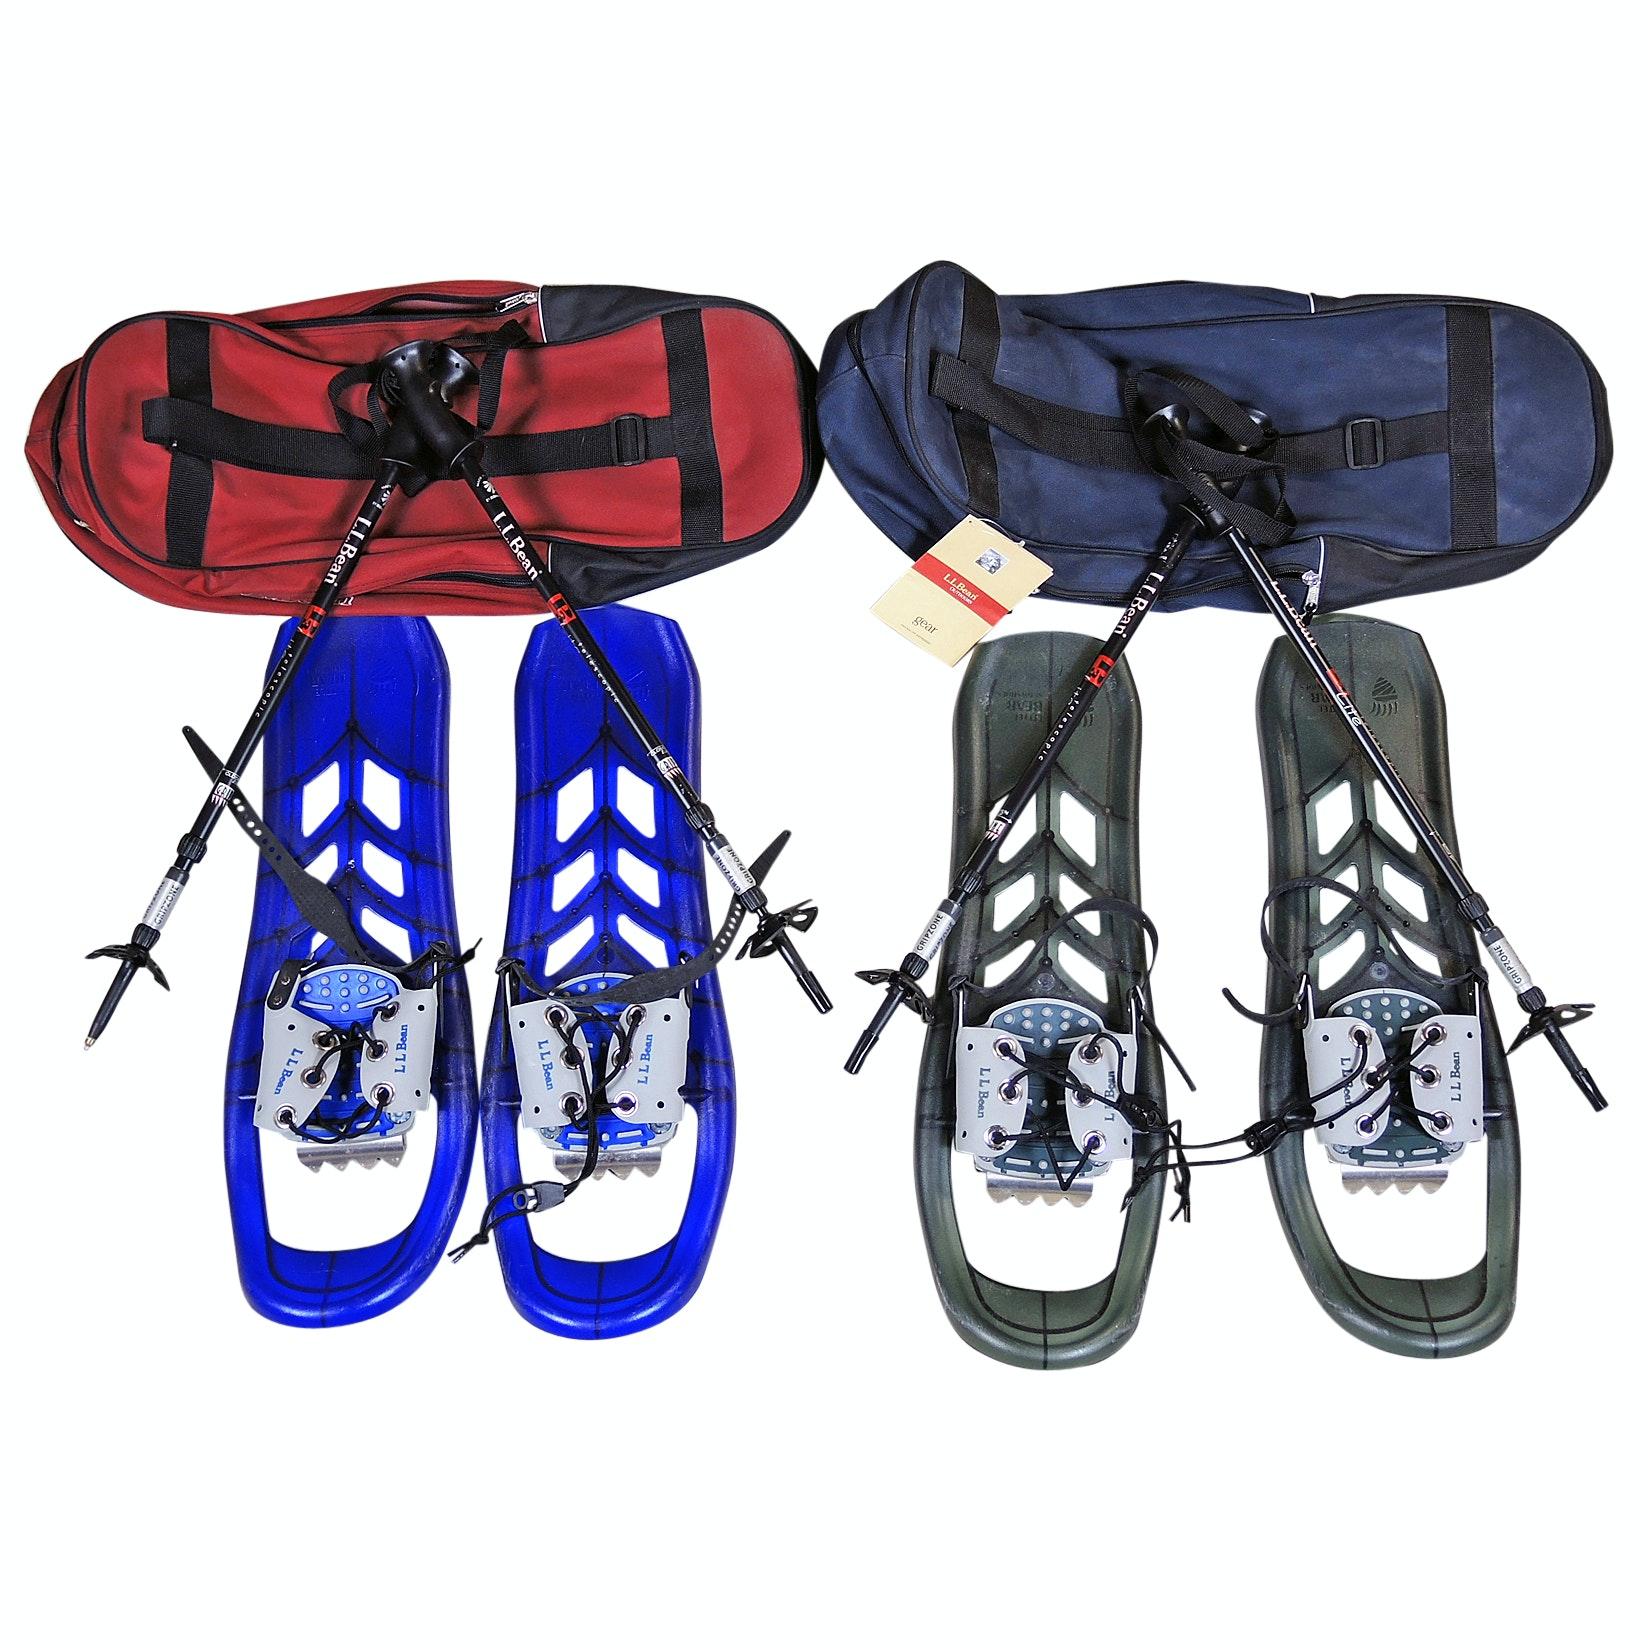 L.L. Bean Snowshoes, Poles and Travel Bags